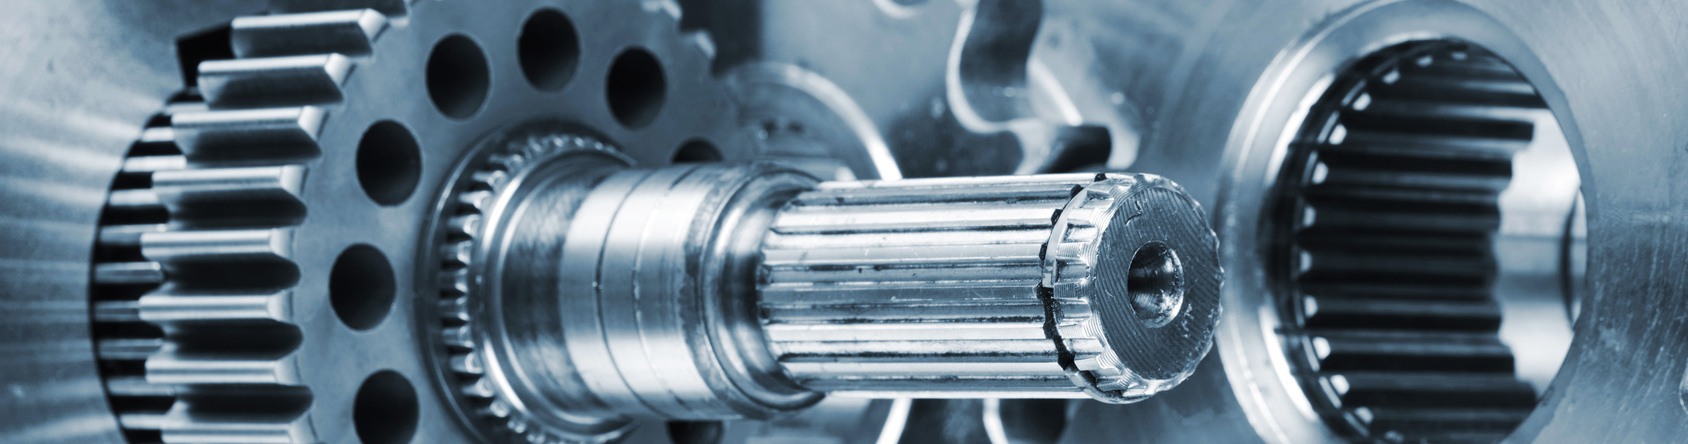 EMCO Lathe & Milling Machine Manufacturer, CNC Training